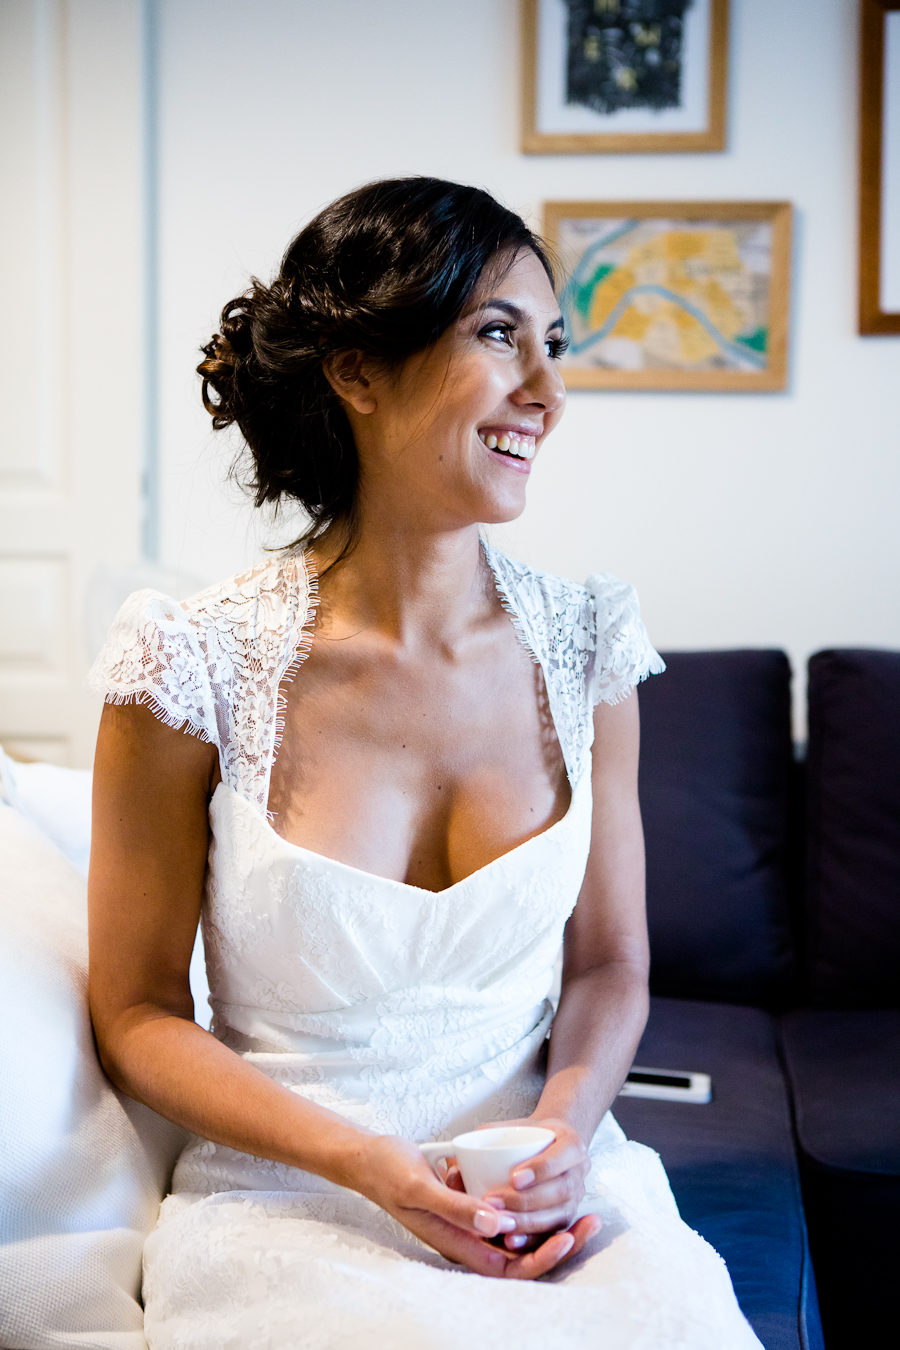 photographe-mariage-keith-flament-grange-de-montmartre-barbery-oise-37